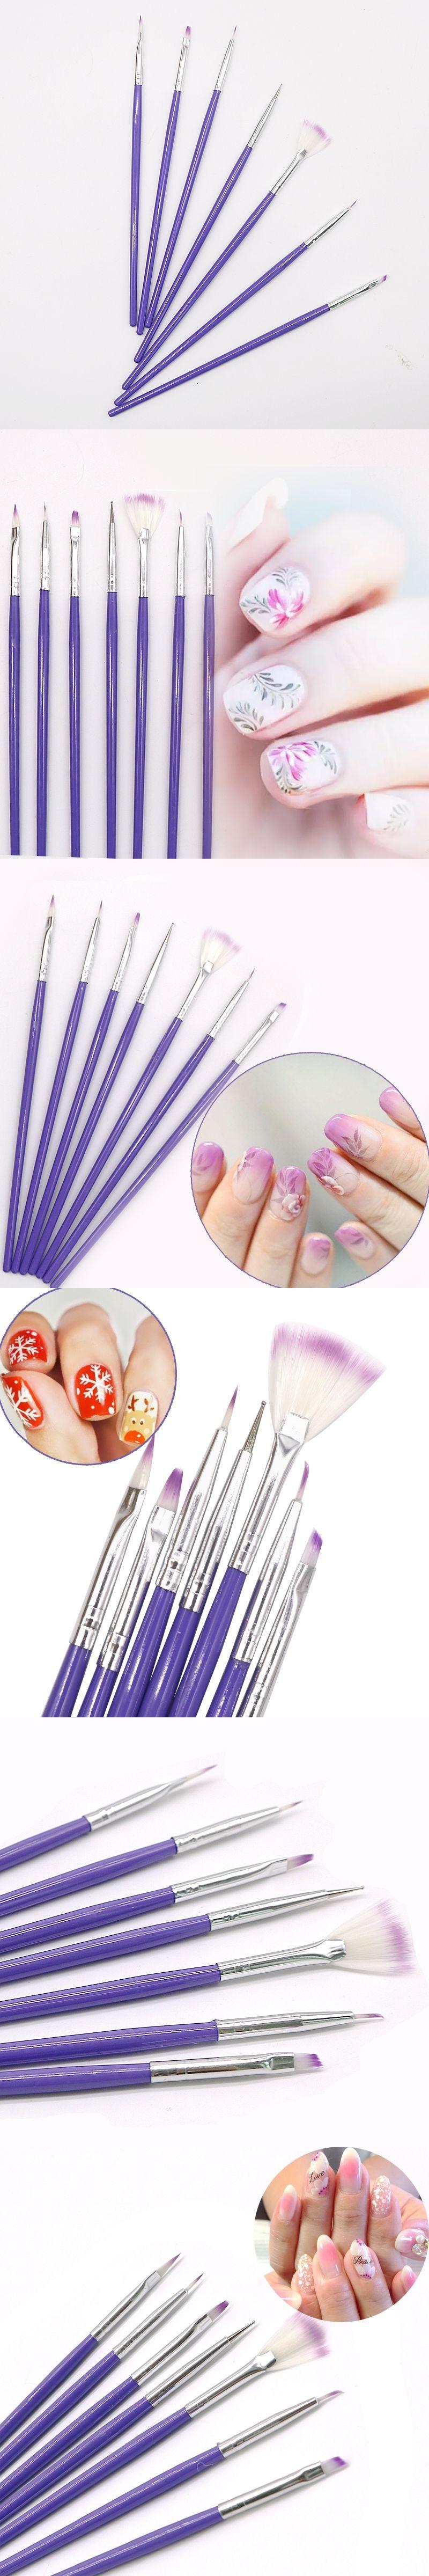 7pcsset Purple Diy Painting Dotting Brushes Pen Set Nail Art Design